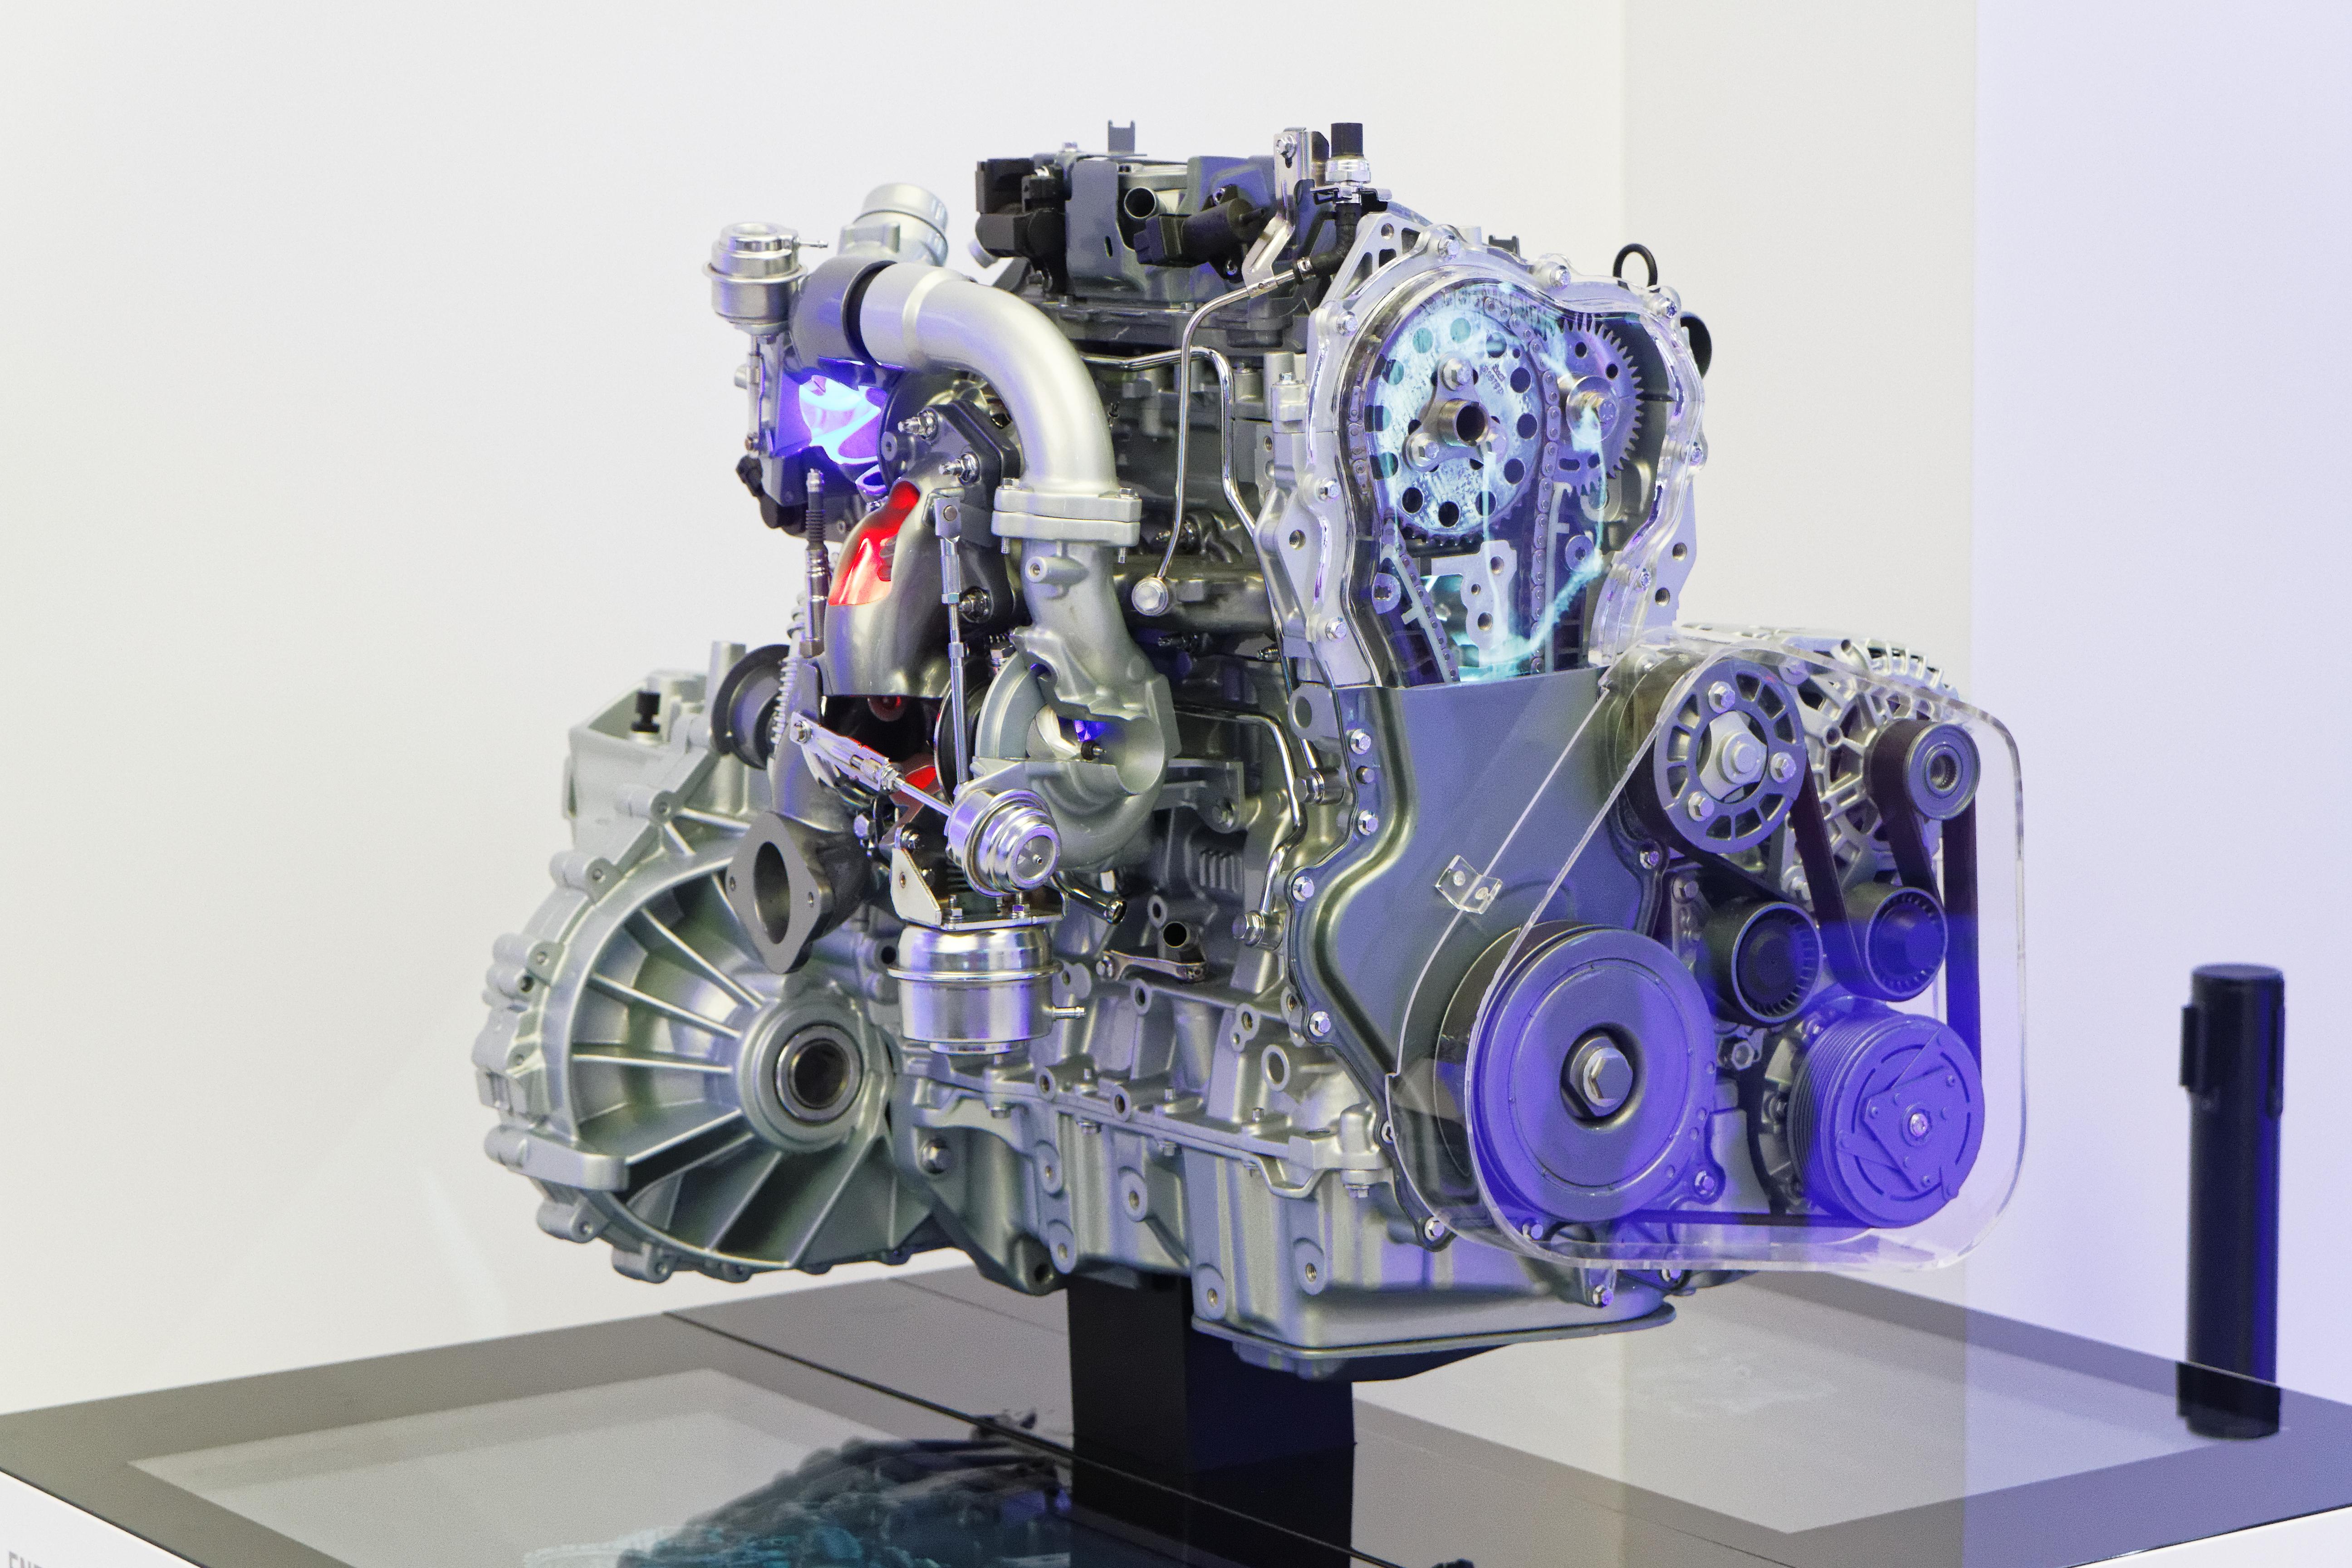 File:Renault moteur energy dCi 160 twin turbo EDC - Mondial